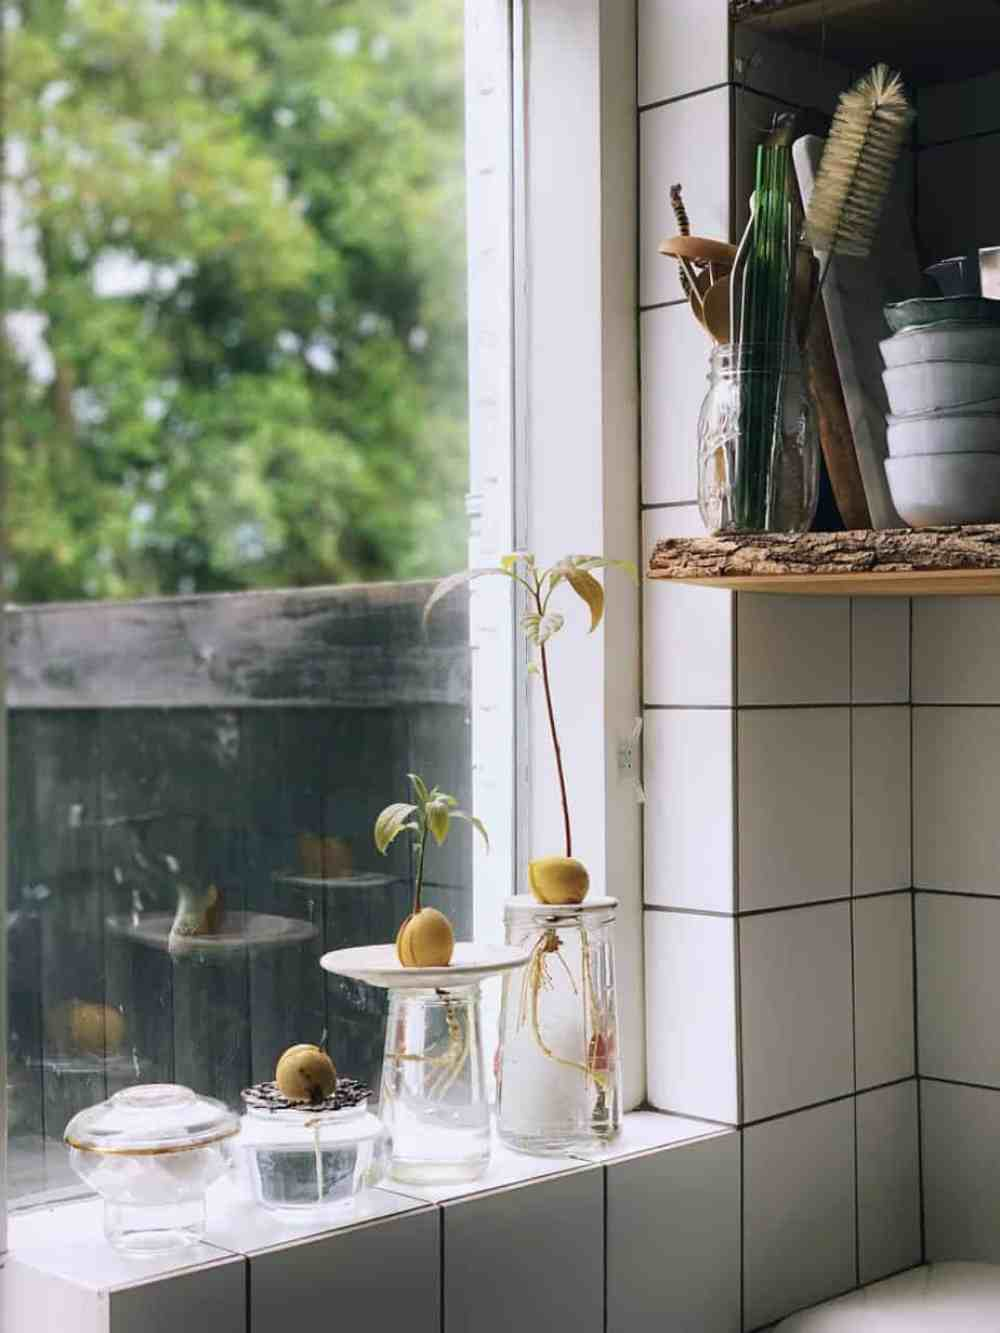 Avocadoplant groeien